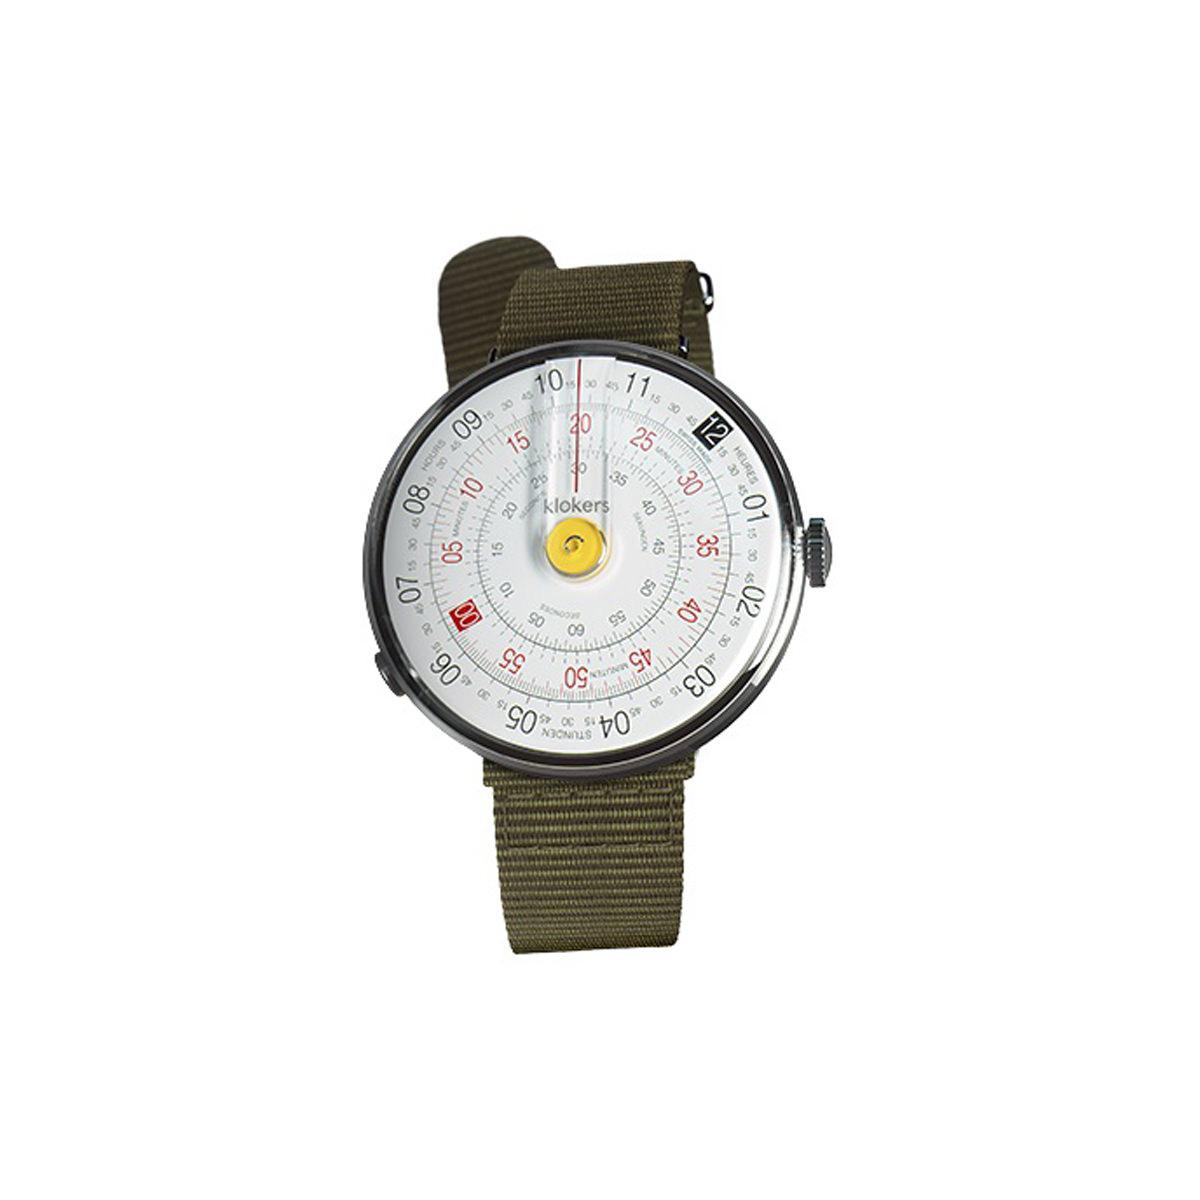 Klokers Klok 01 Textile Strap Watch